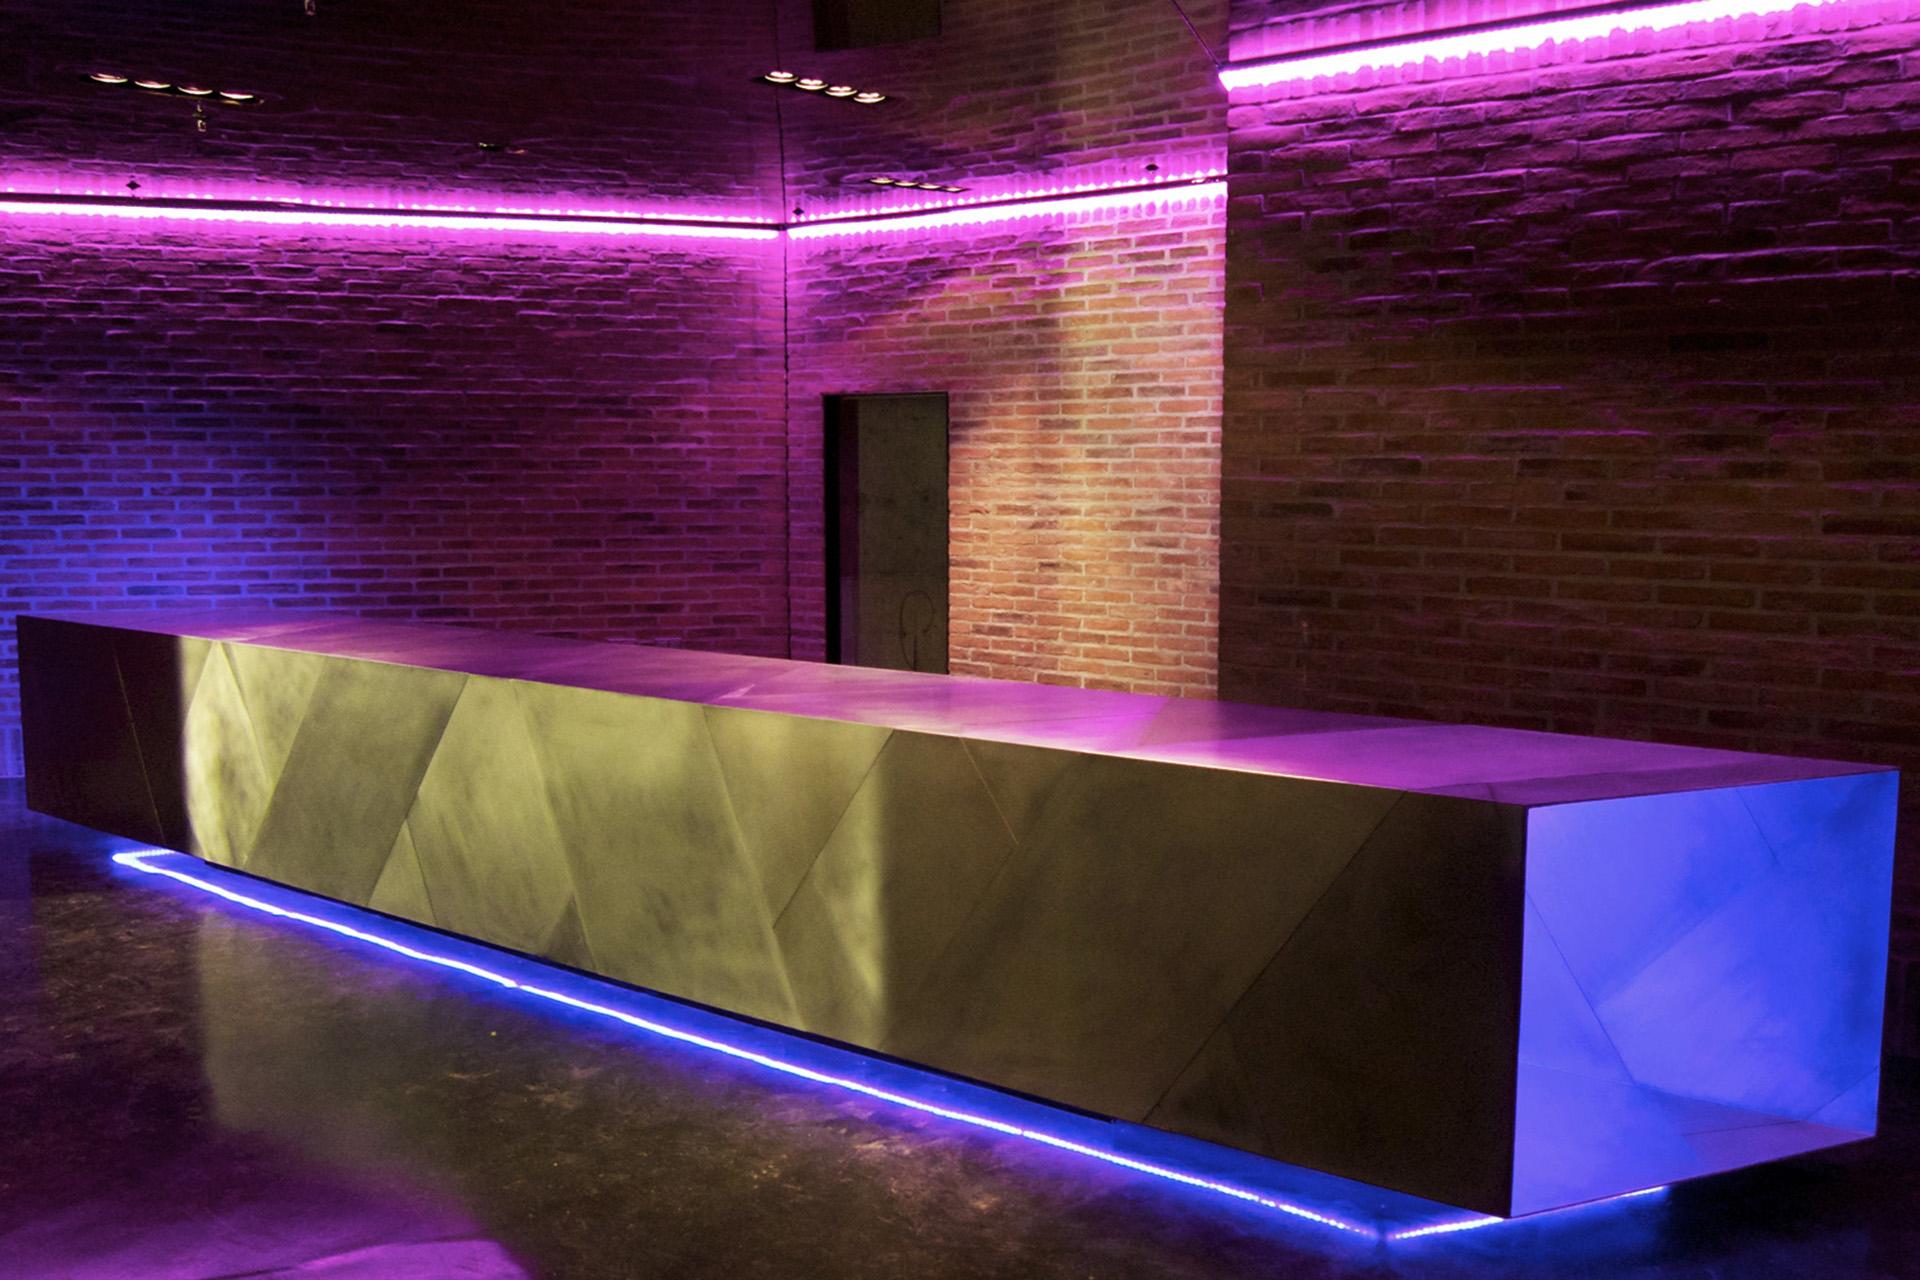 008-interior-design-hospitality-night-club-bar-skybar-muenchen-buero-philipp-moeller.jpg